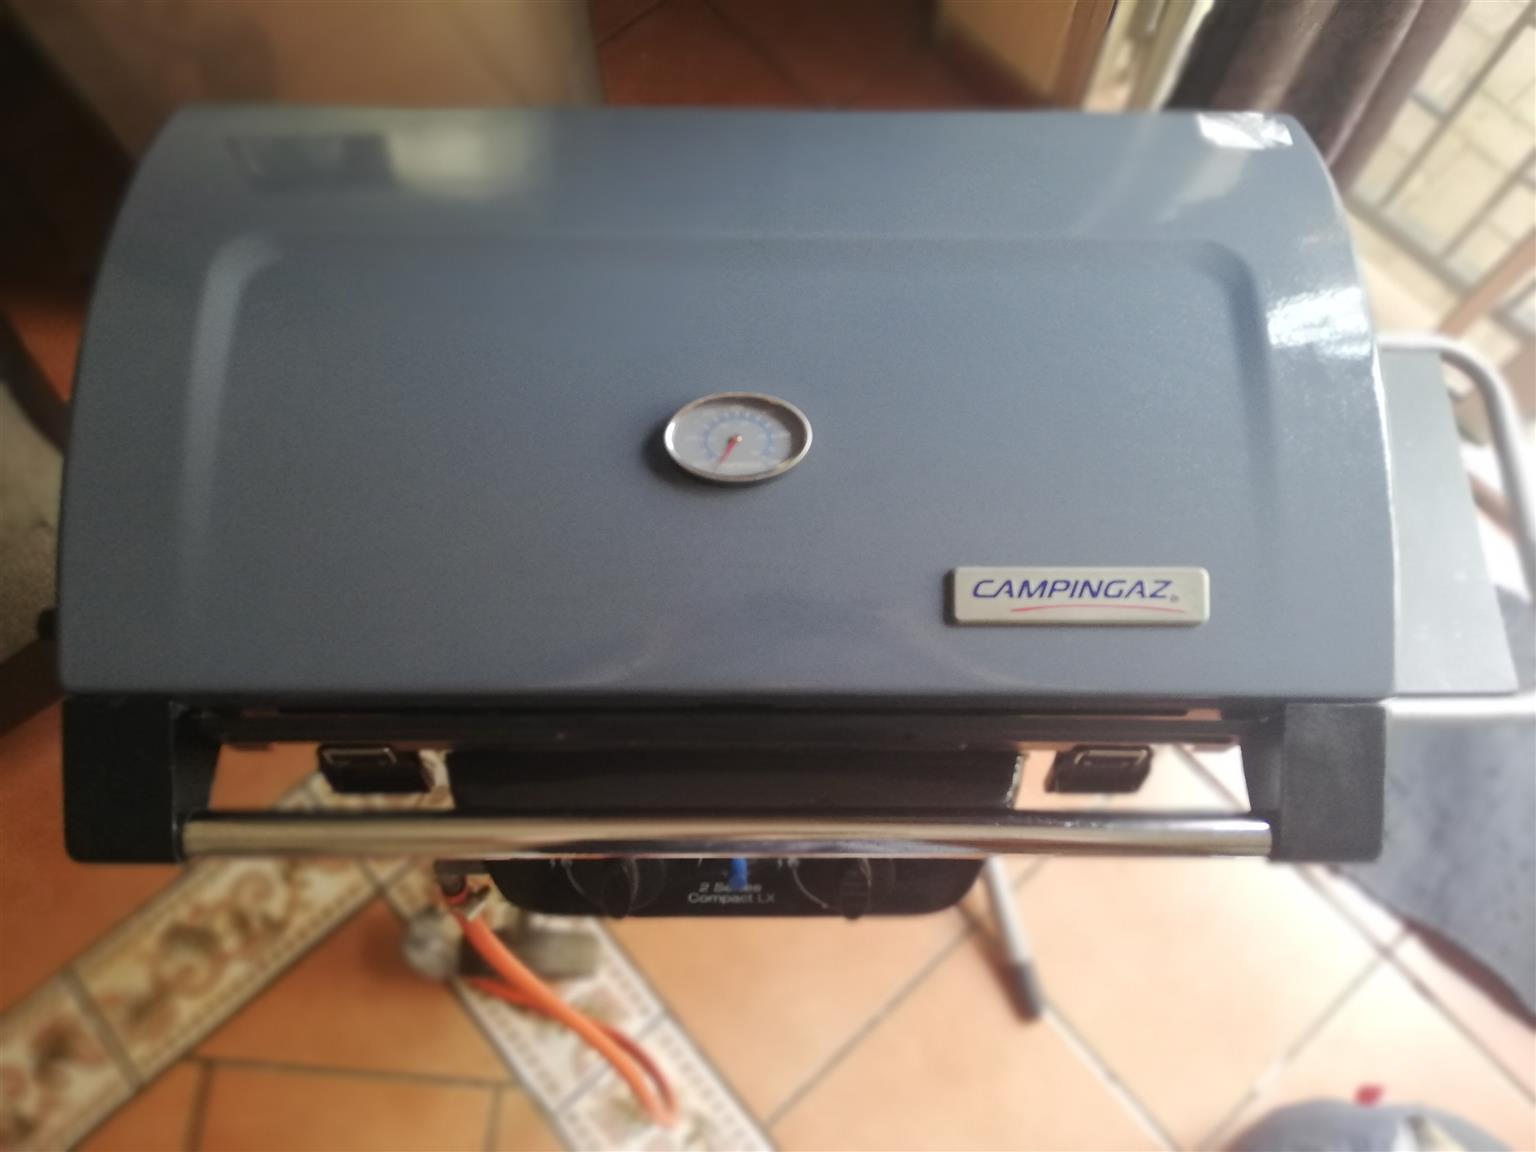 Campingaz 2 series compact gas braai